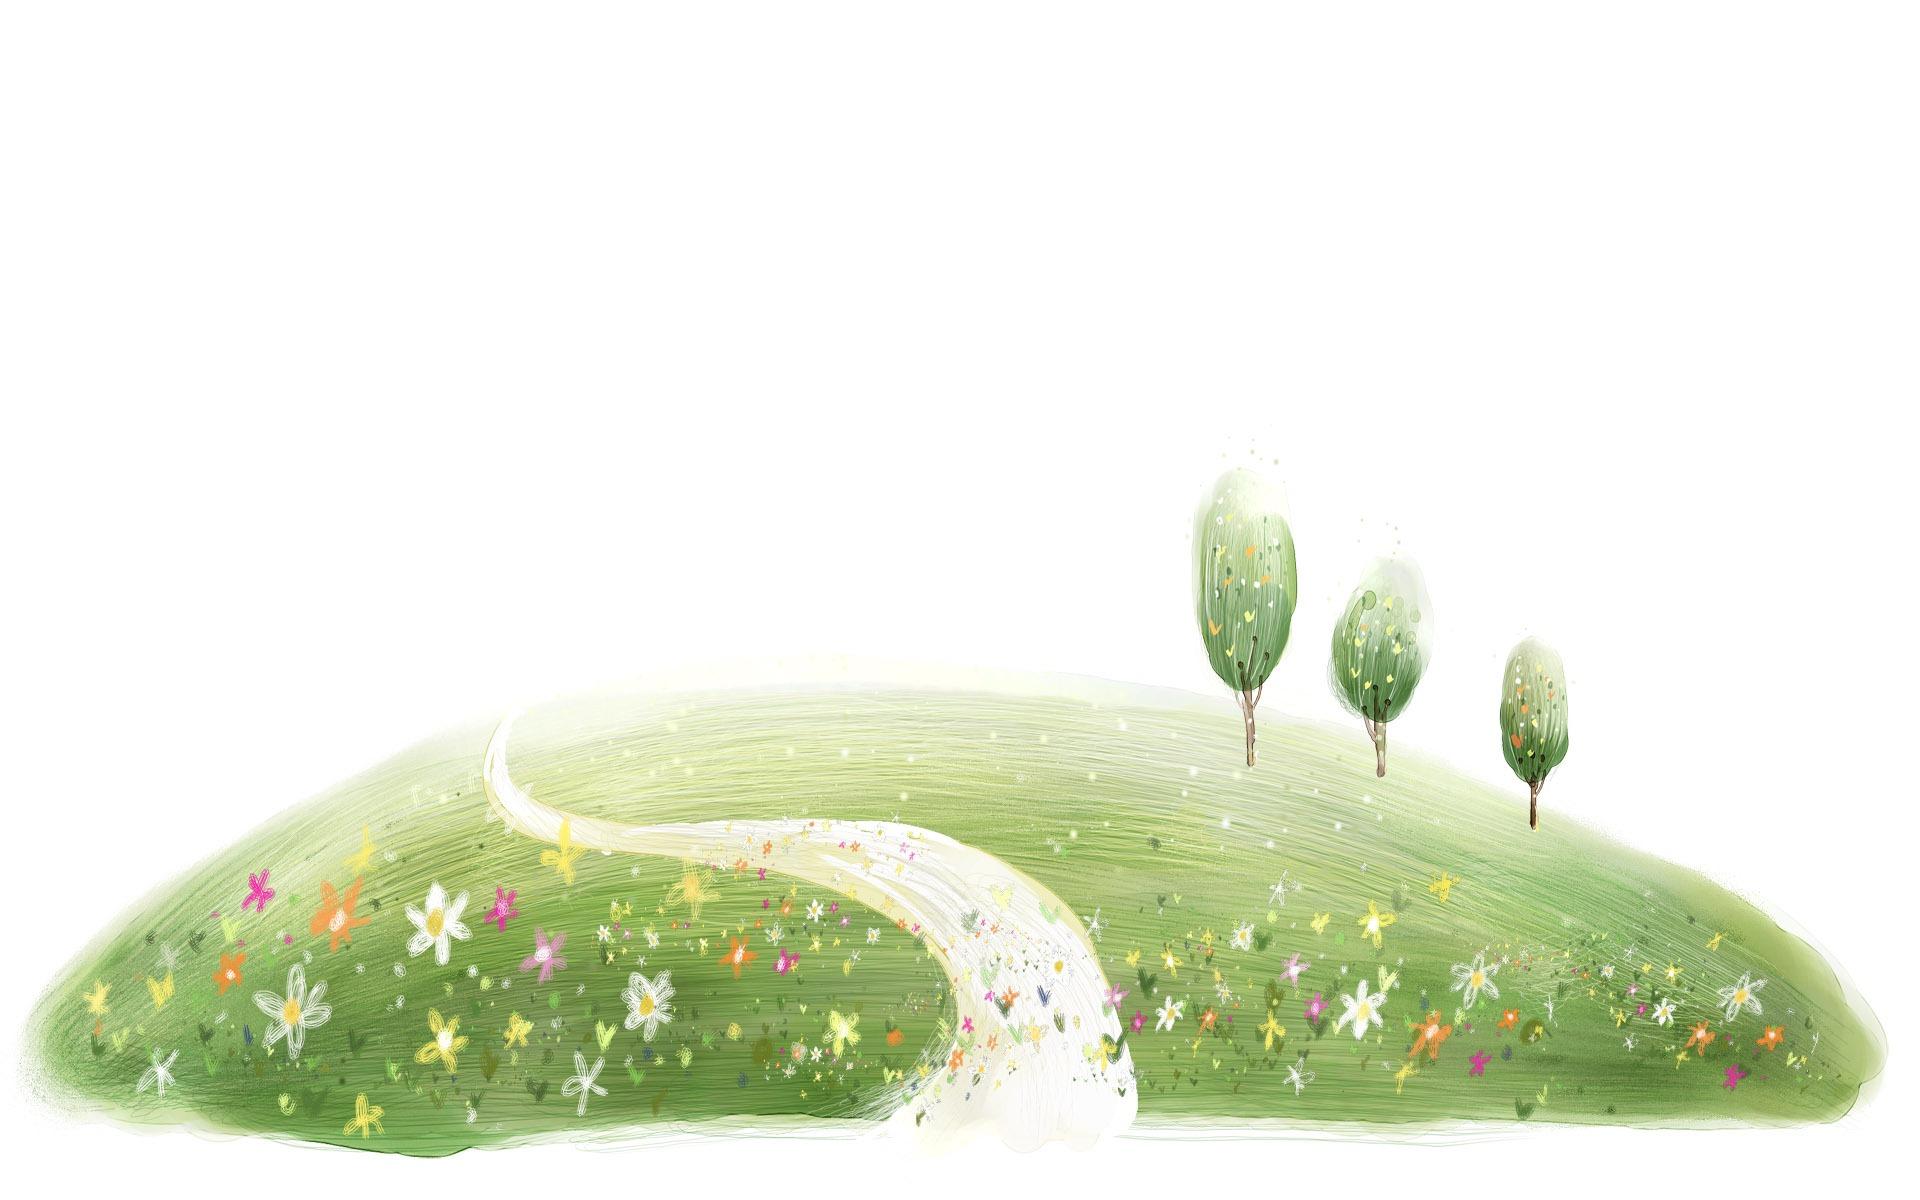 Kresleny Tapety Fantasy Krajina 6 1920x1200 Wallpaper Ke Stazeni